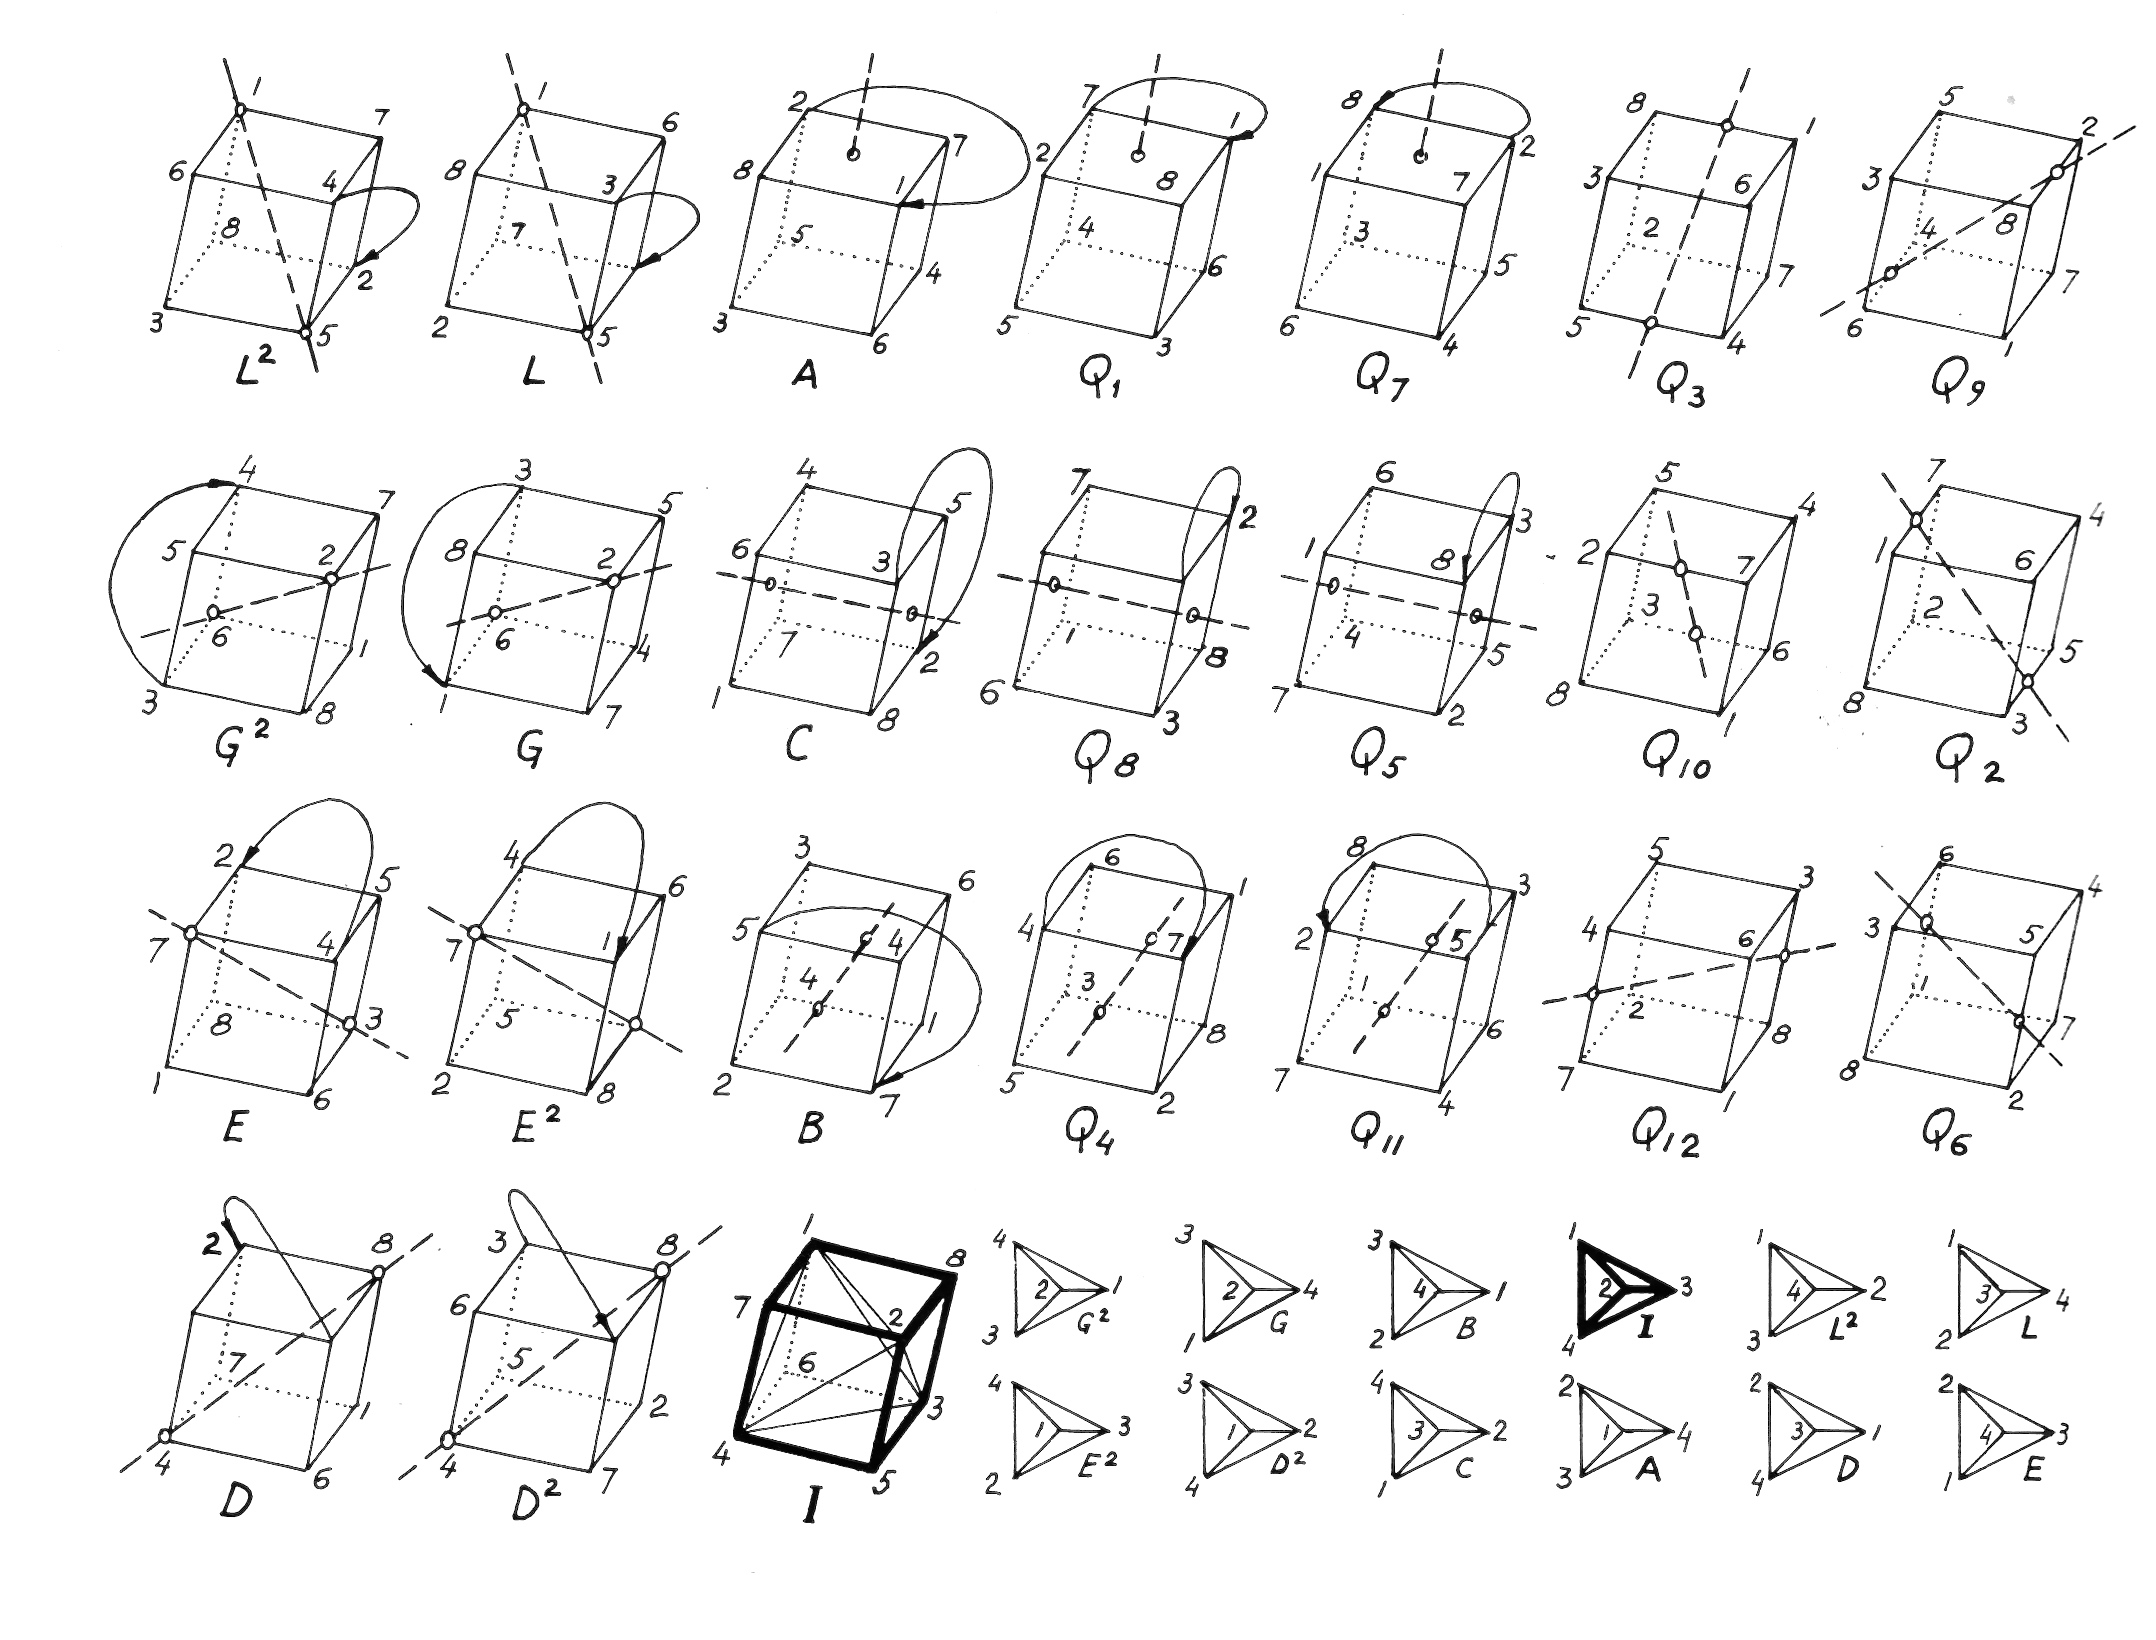 Xen_cubes_Nomos_0001.jpg